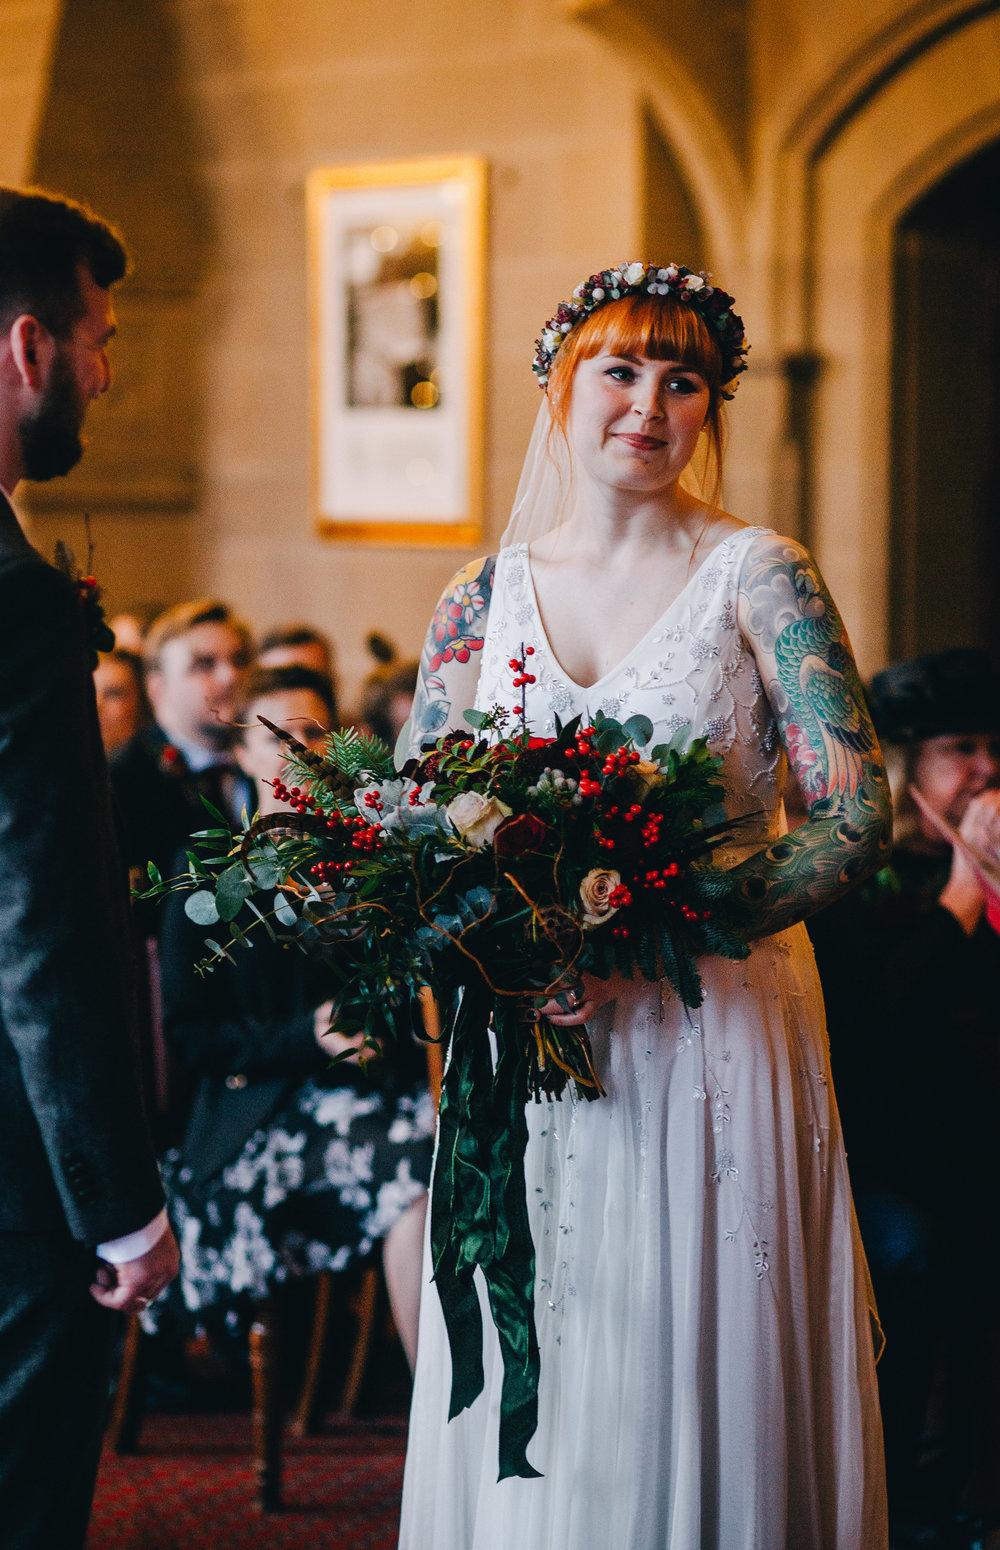 wedding ceremony at Manchester town hall - Rachel Joyce photography